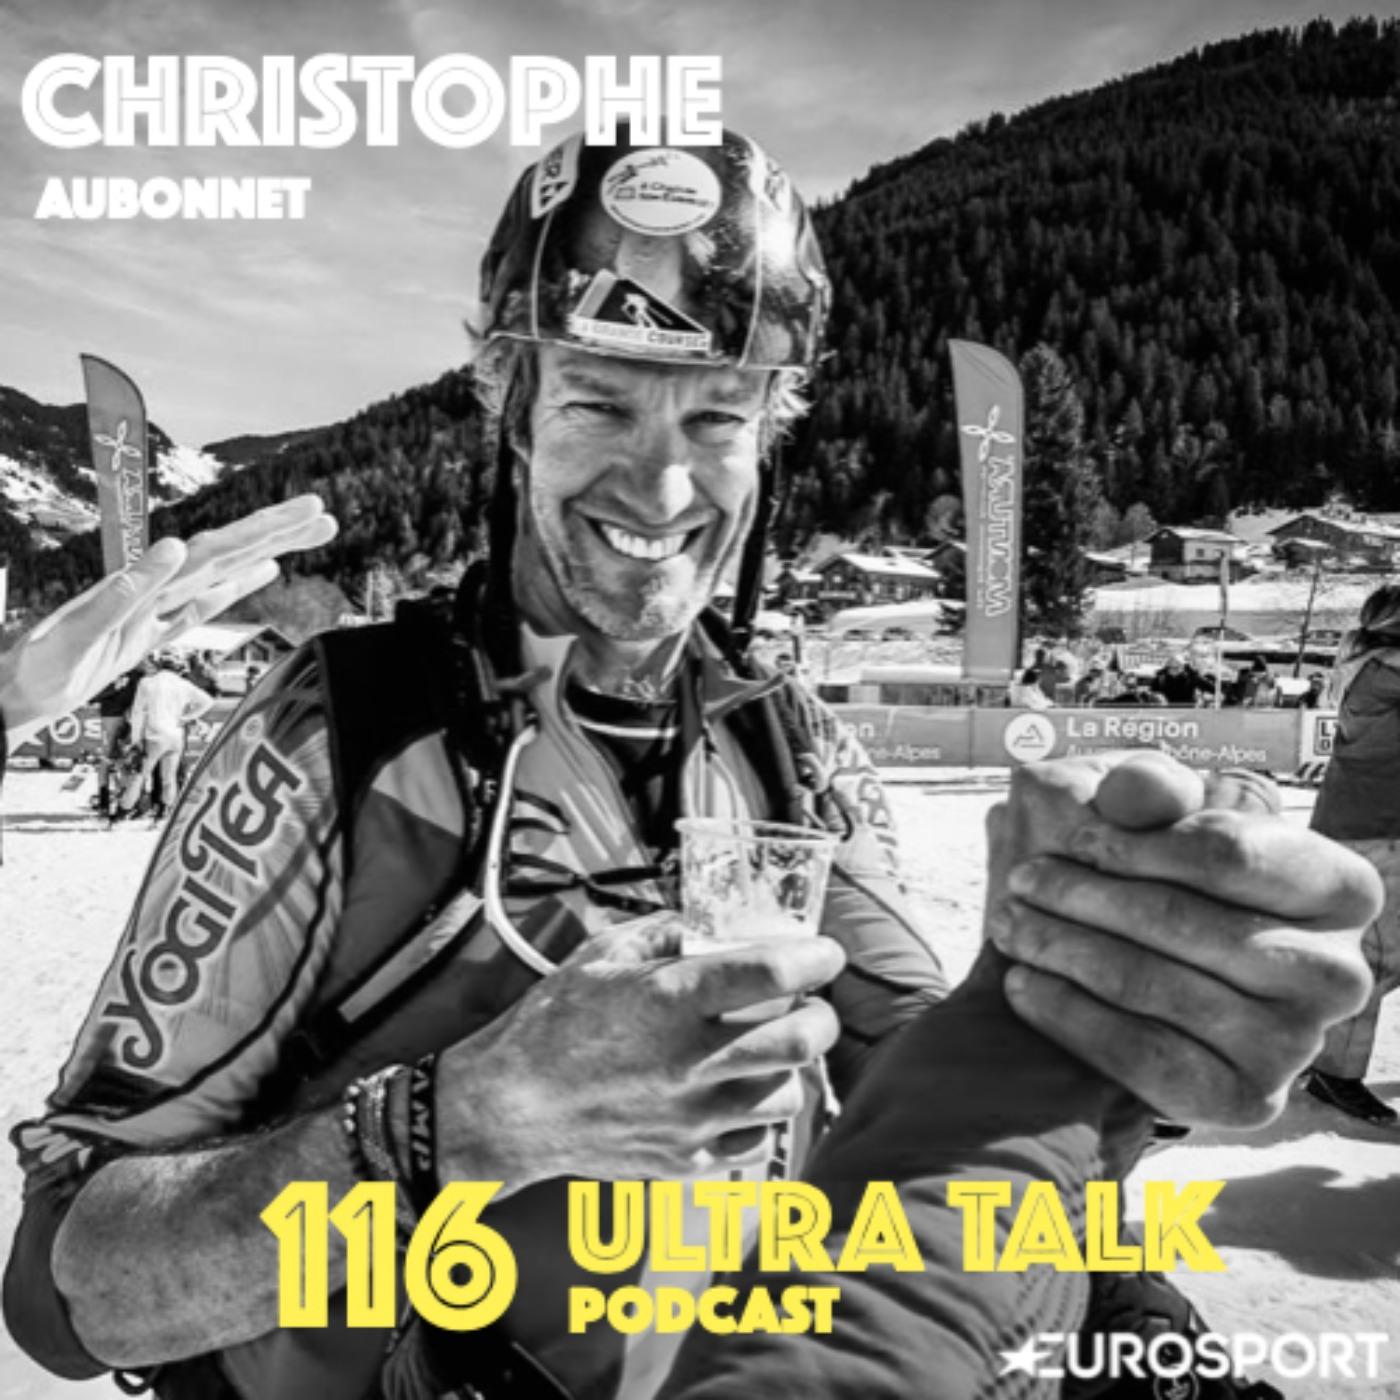 UTMB, Ironman, Raid Aventure... Christophe Aubonnet : l'ultra finisher